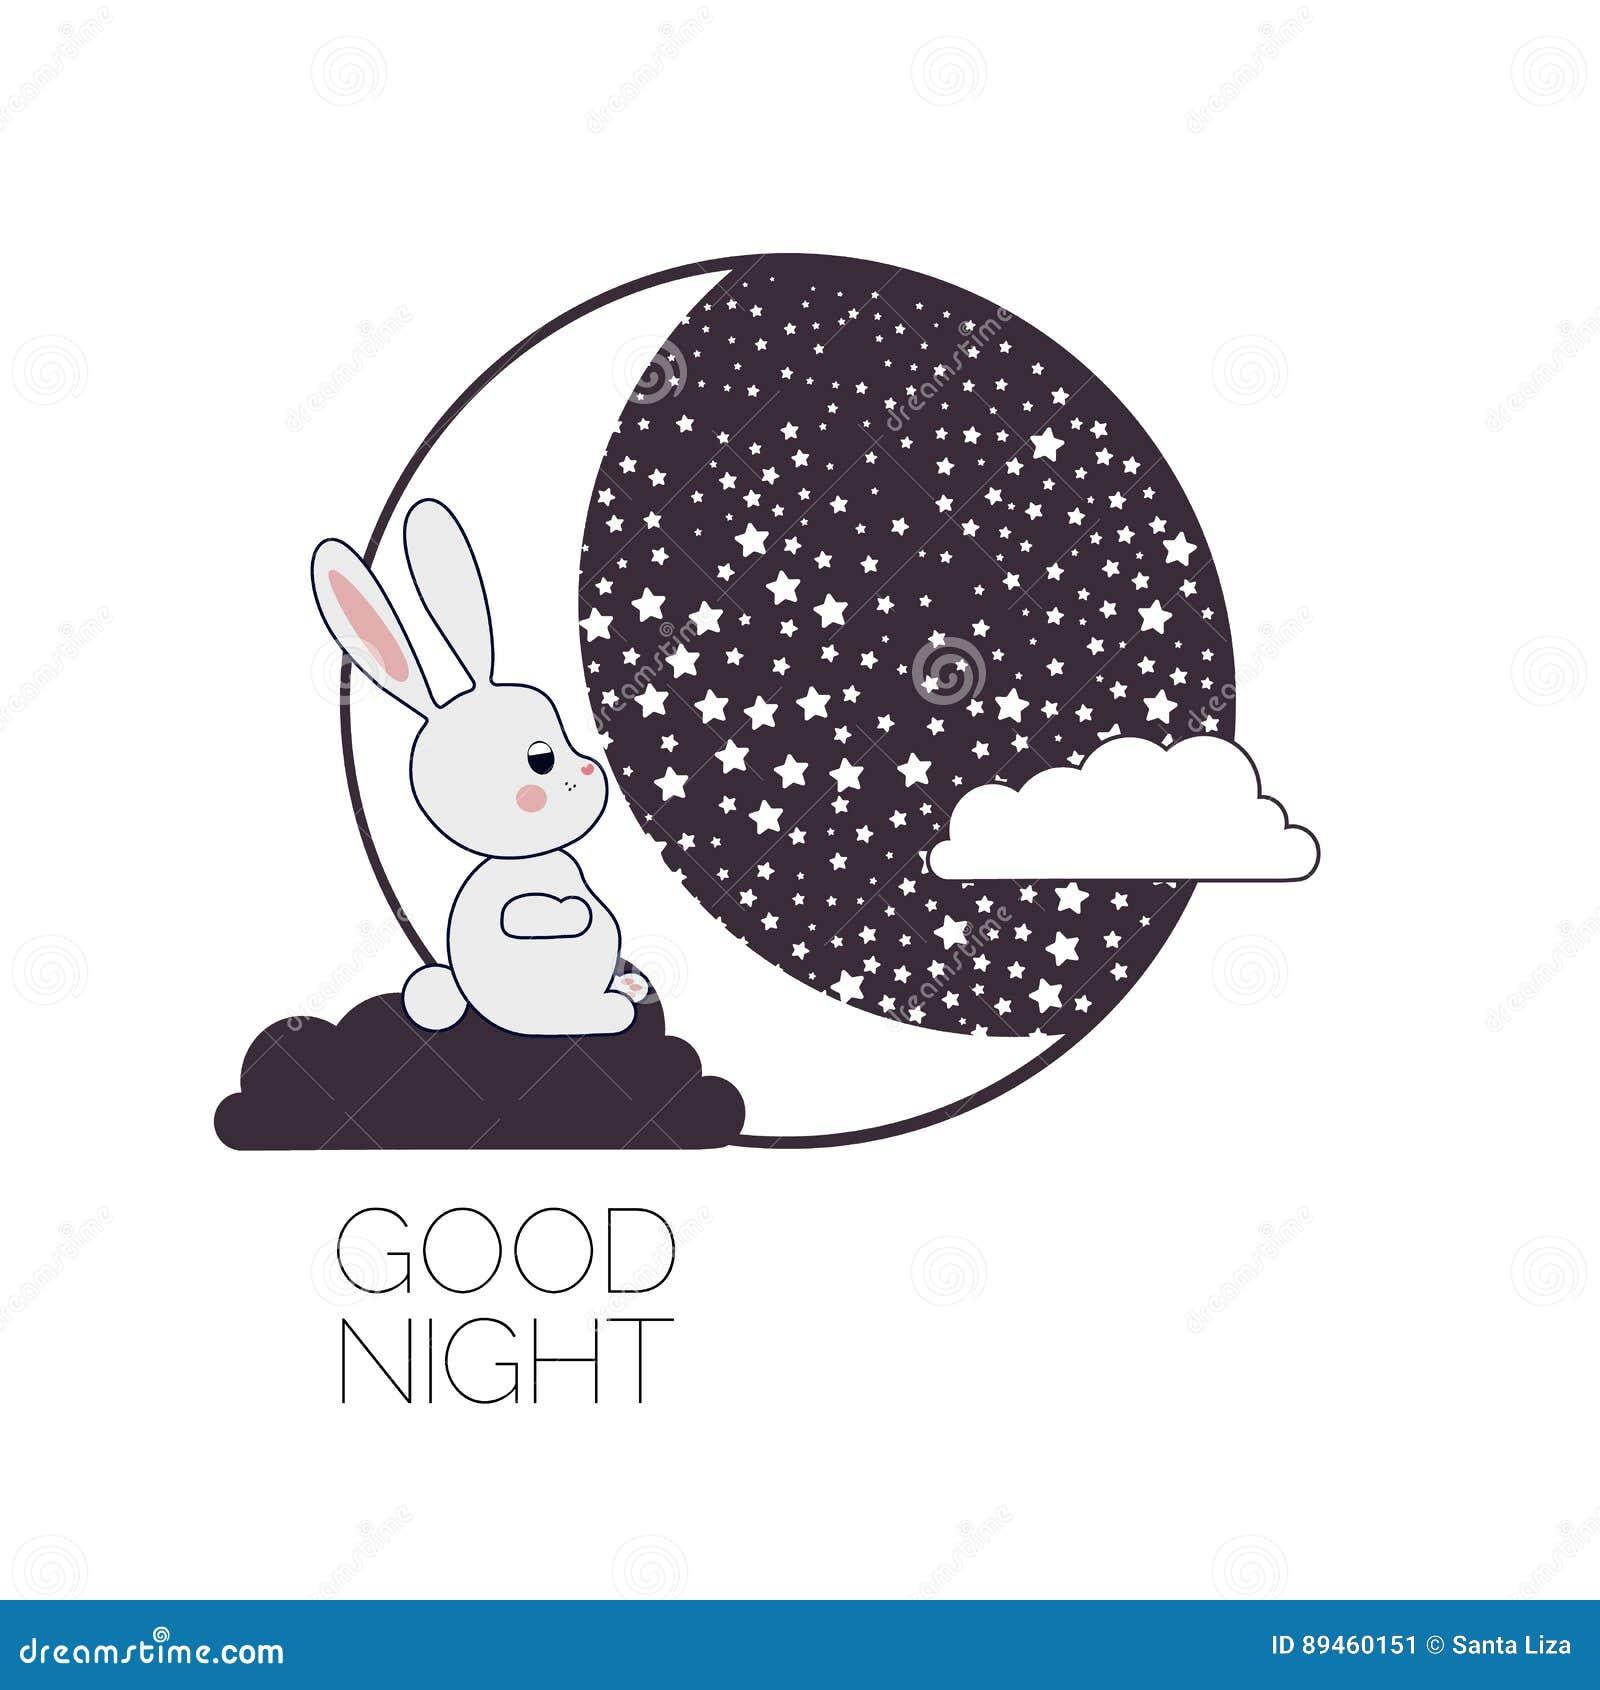 Moon and dreaming rabbit.